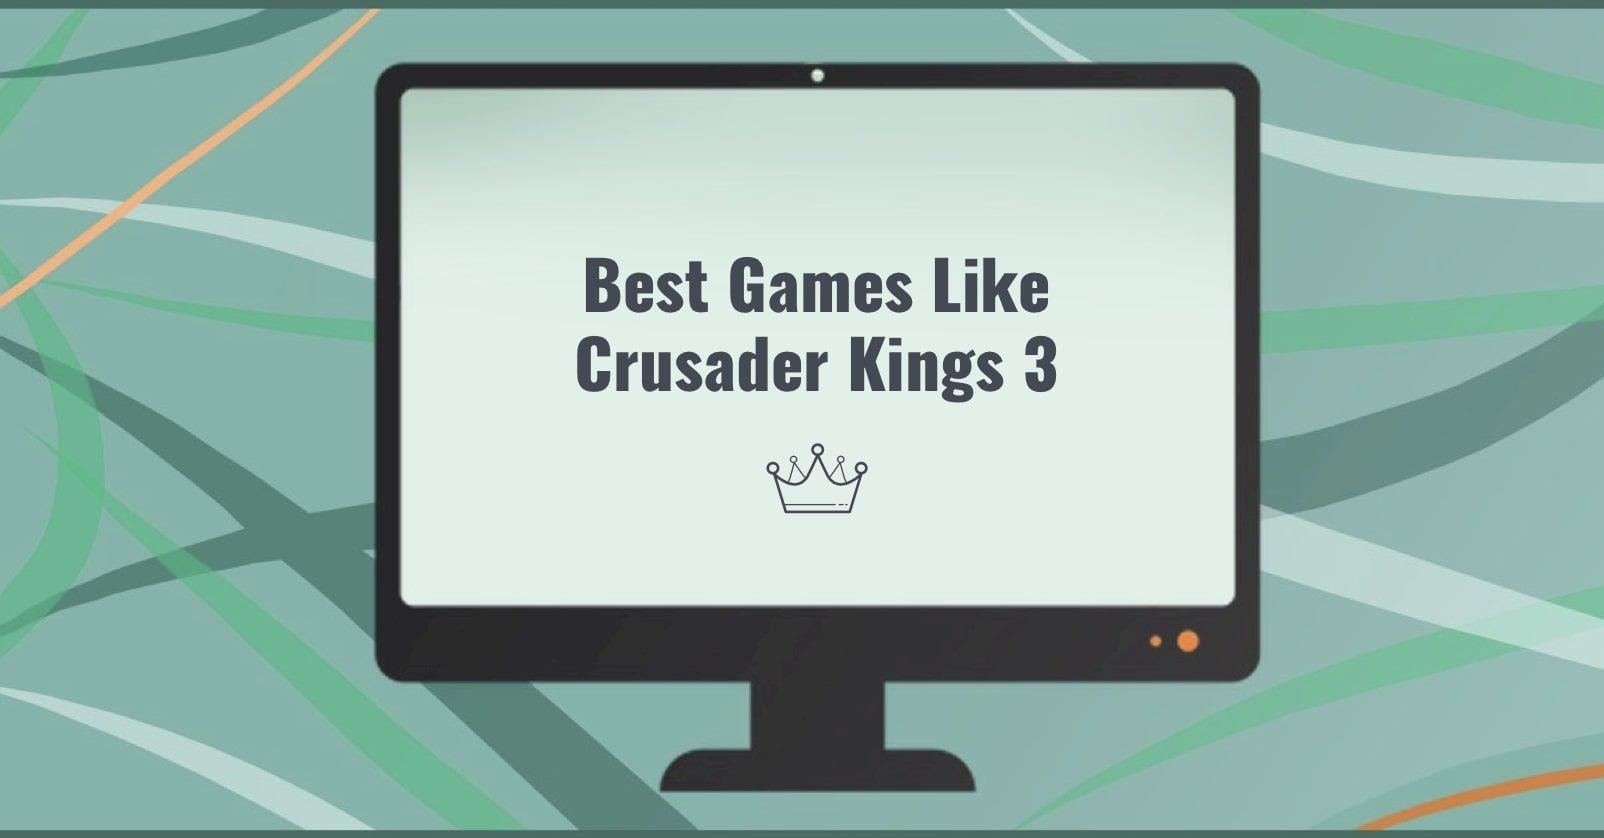 Best Games Like Crusader Kings 3 for PC